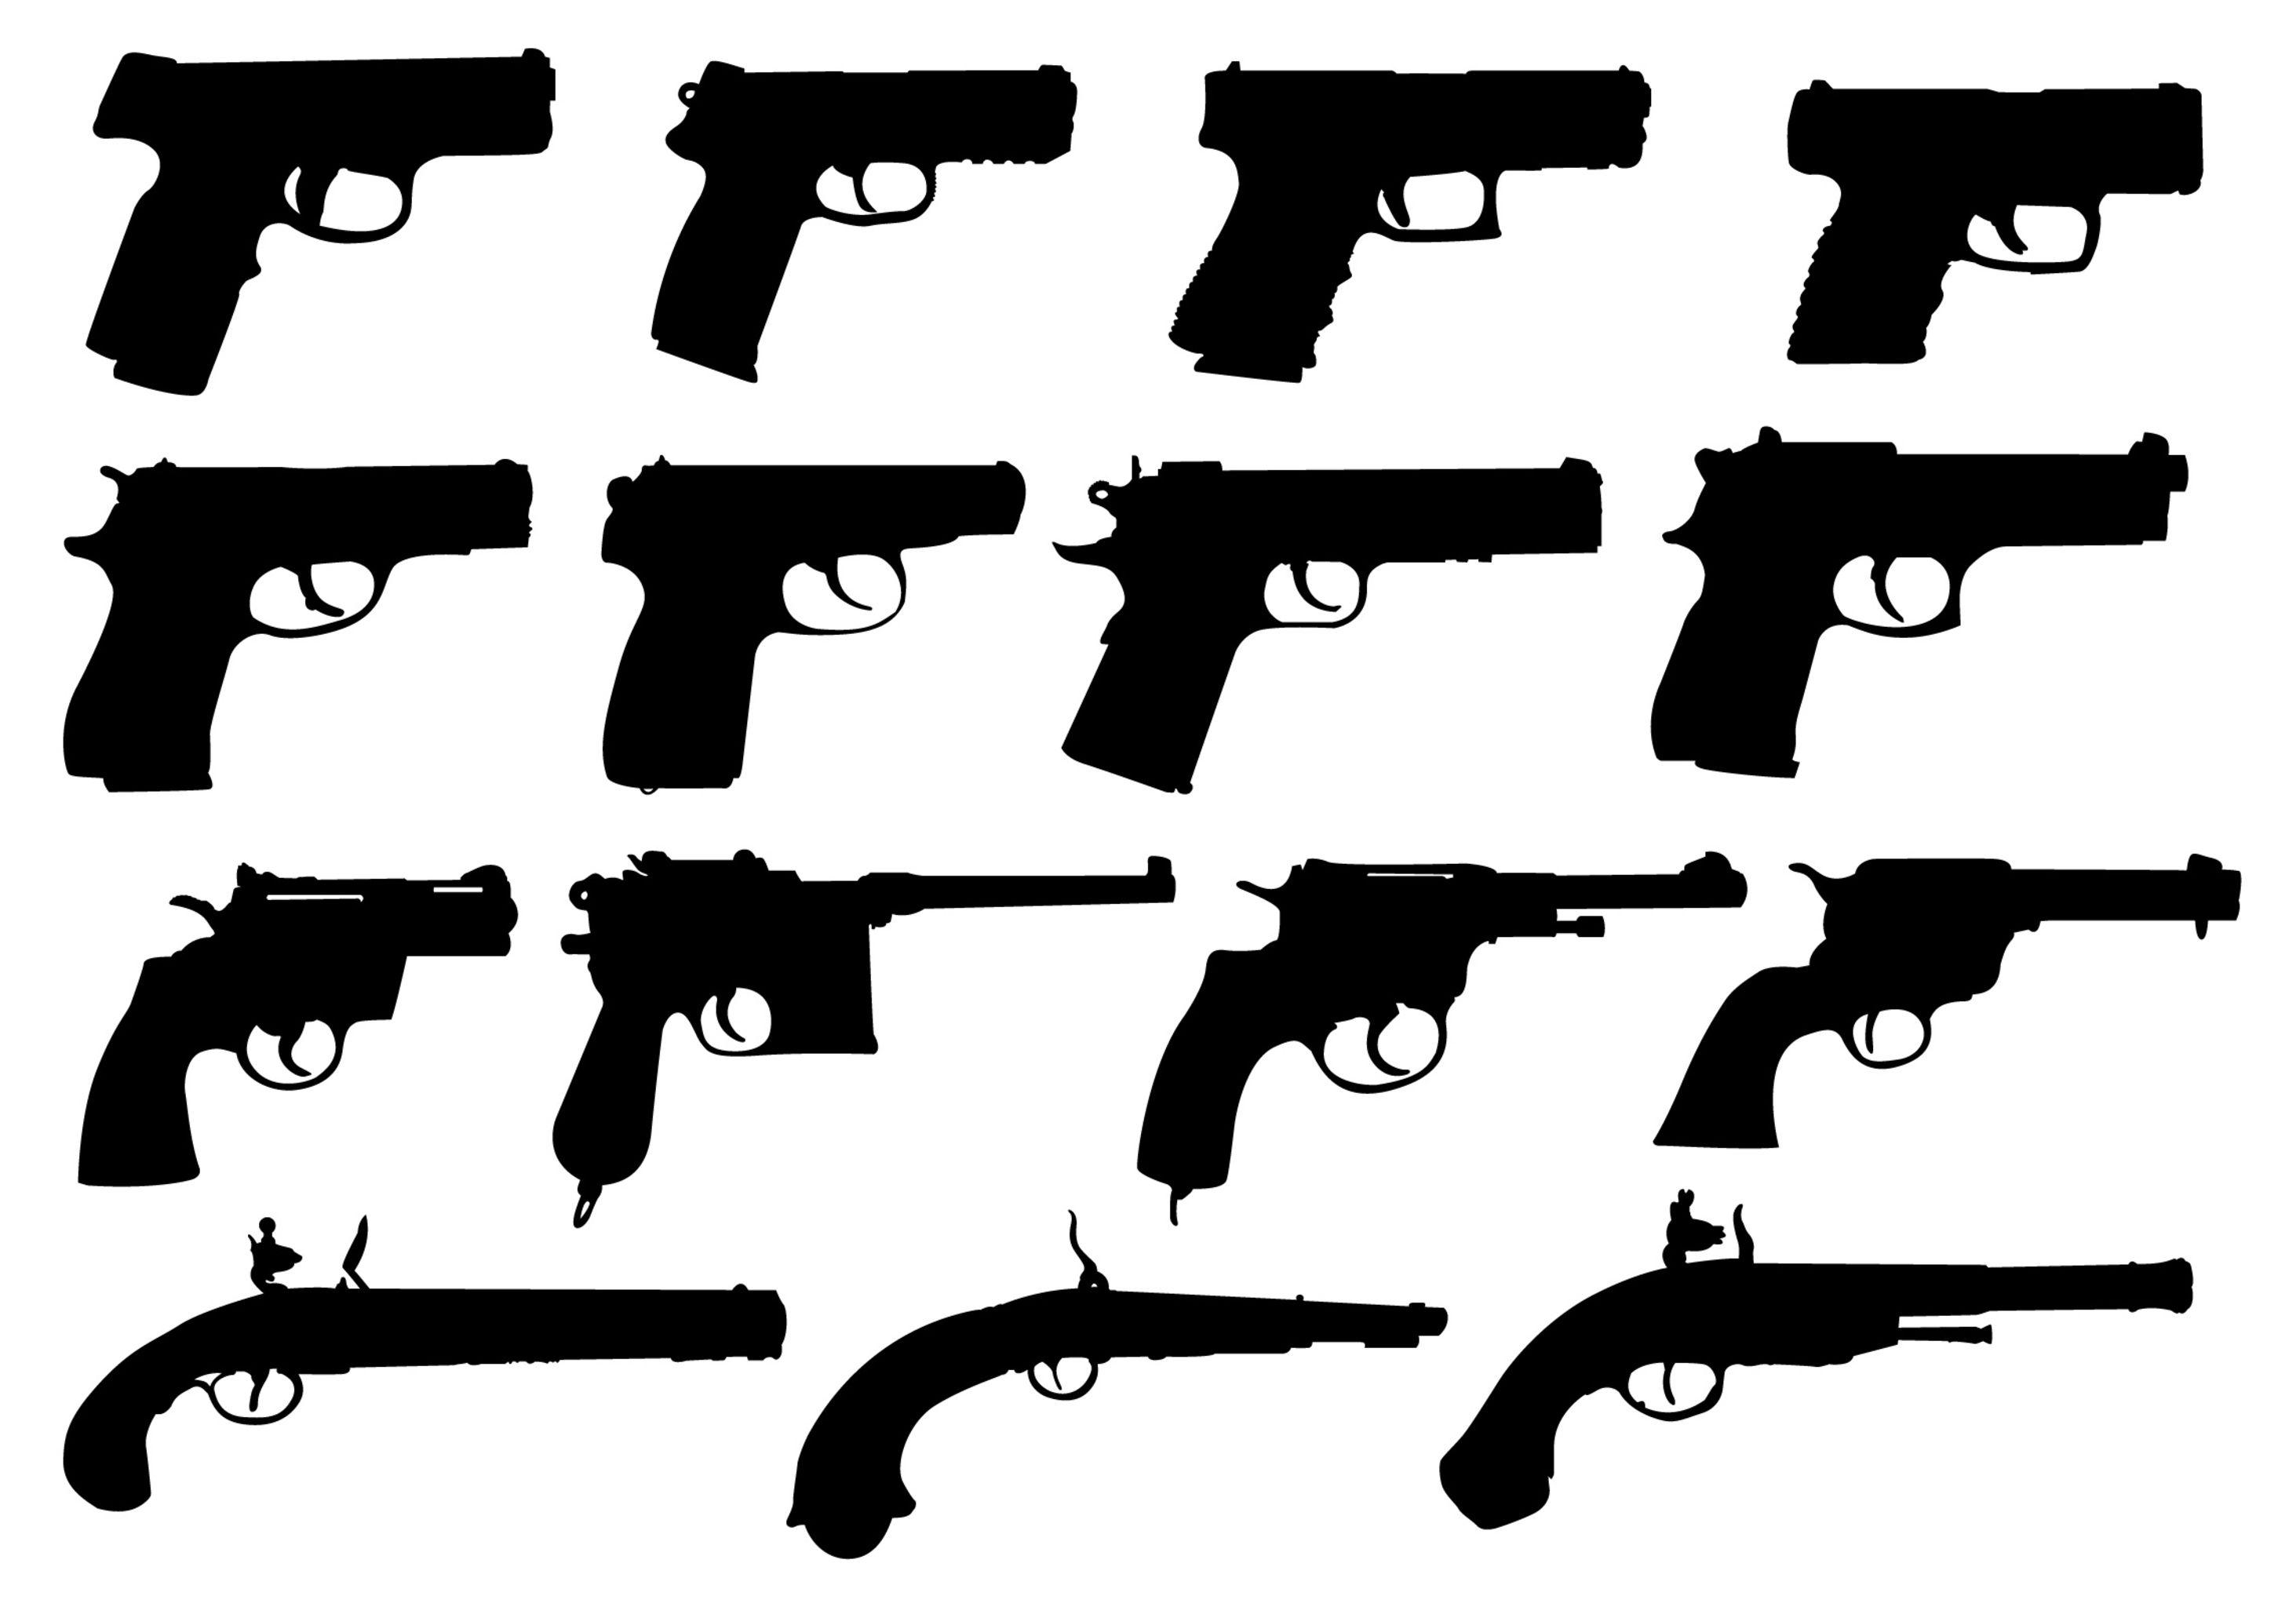 Pistols and handguns